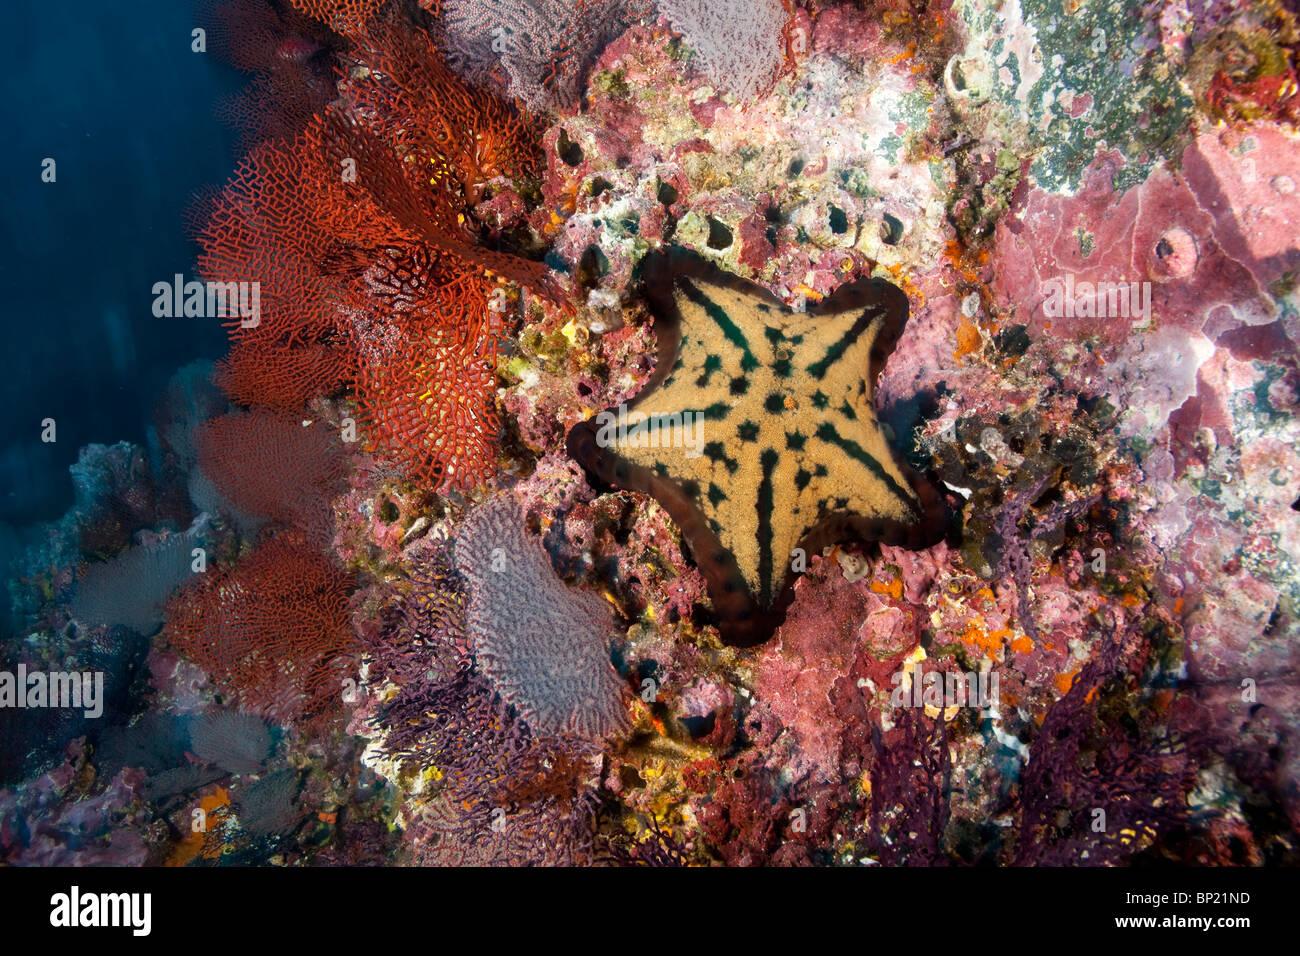 Chocolate Chip Starfish, Nidorellia armata, Malpelo, East Pacific ...